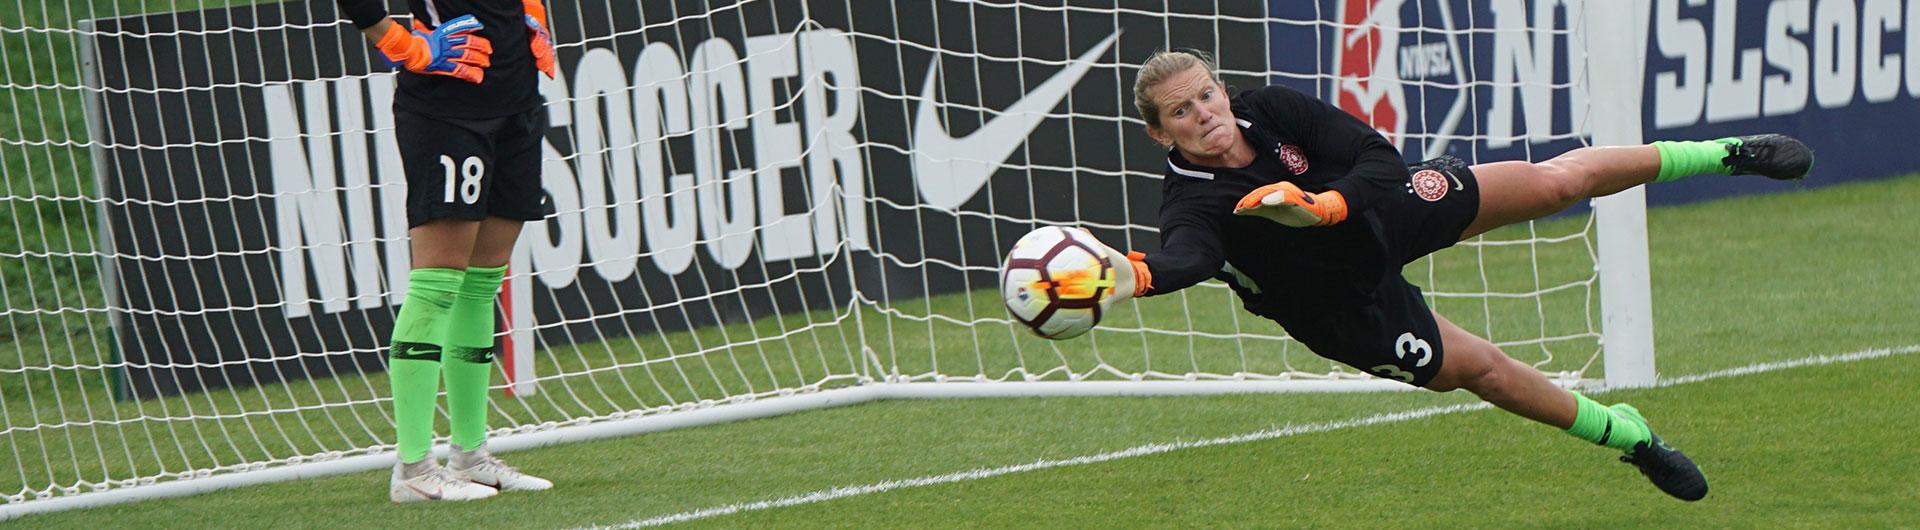 Goalkeeper Save Soccer Referee Assessor